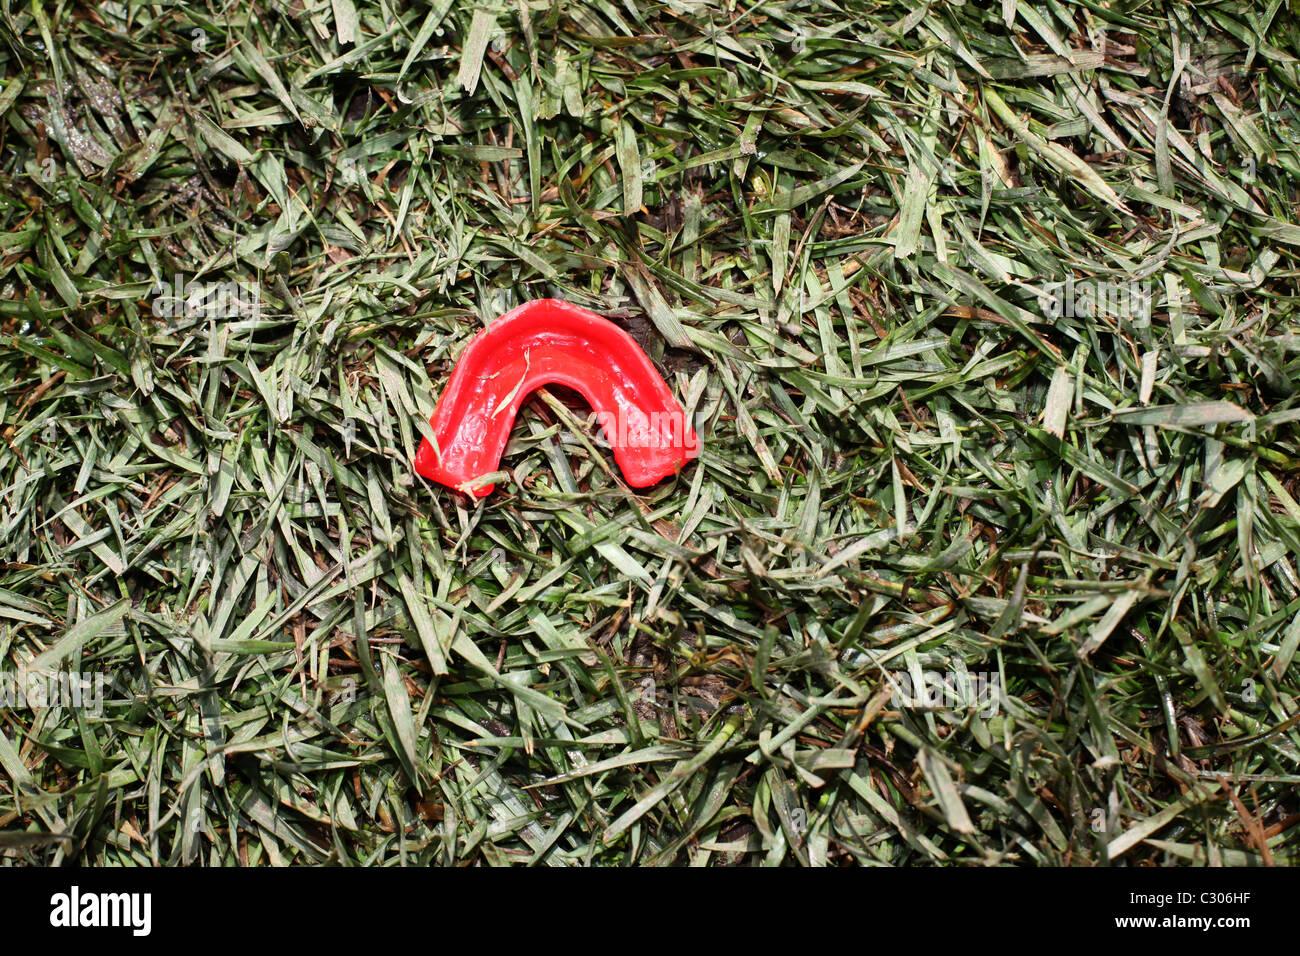 Protège-dents Rugby sur pelouse. Photo Stock